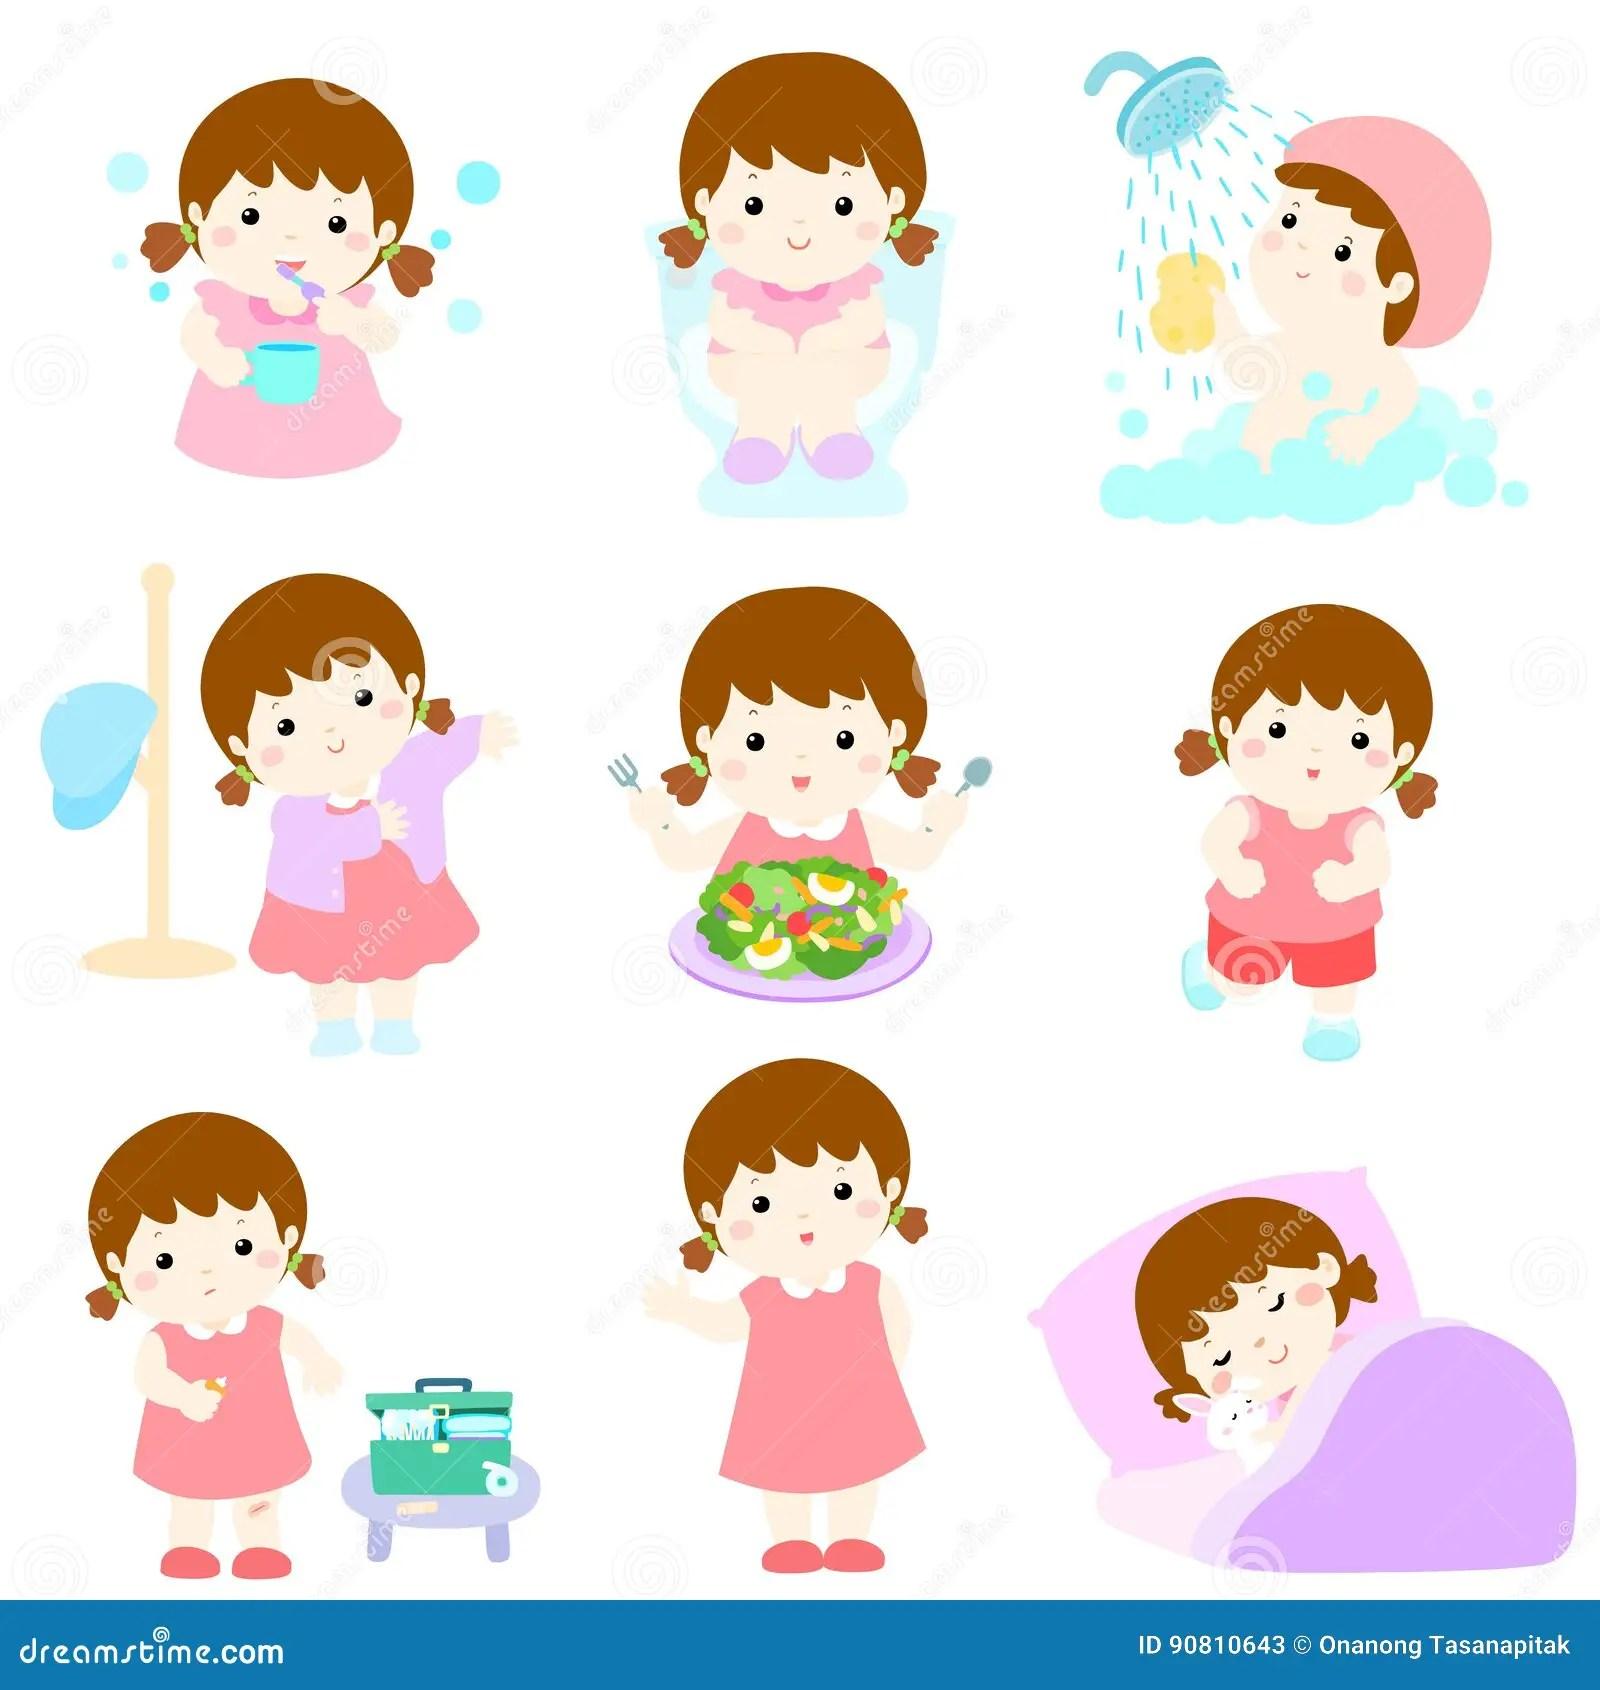 Daily Healthy Routine For Girl Cartoon Cartoon Vector